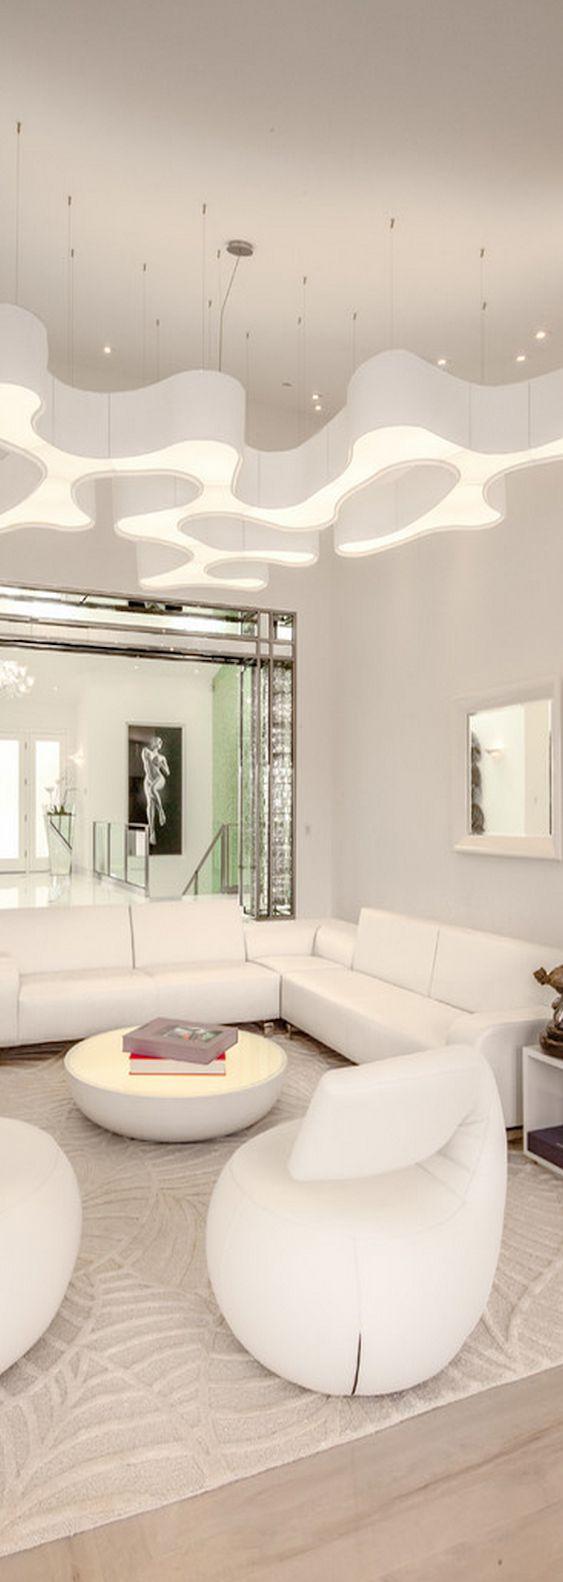 184 best Diseño minimalista para casas images on Pinterest   Home ...